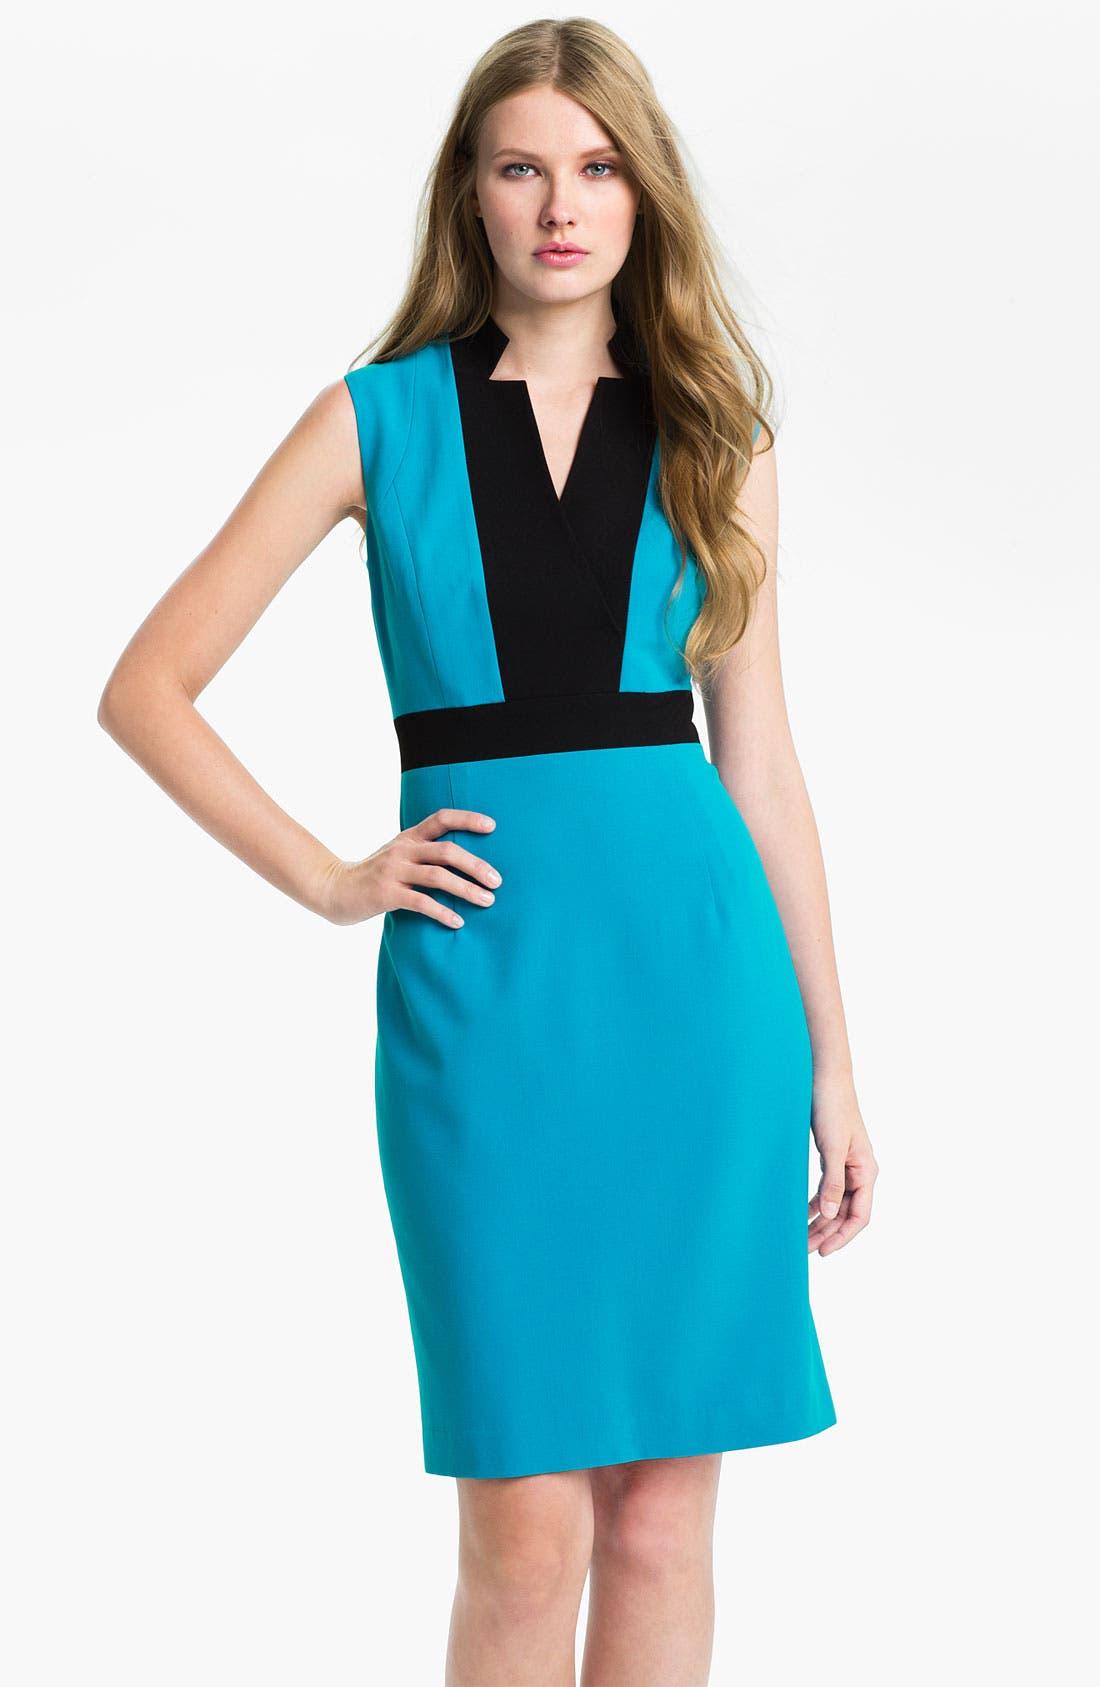 Alternate Image 1 Selected - Calvin Klein Colorblock Sleeveless Sheath Dress